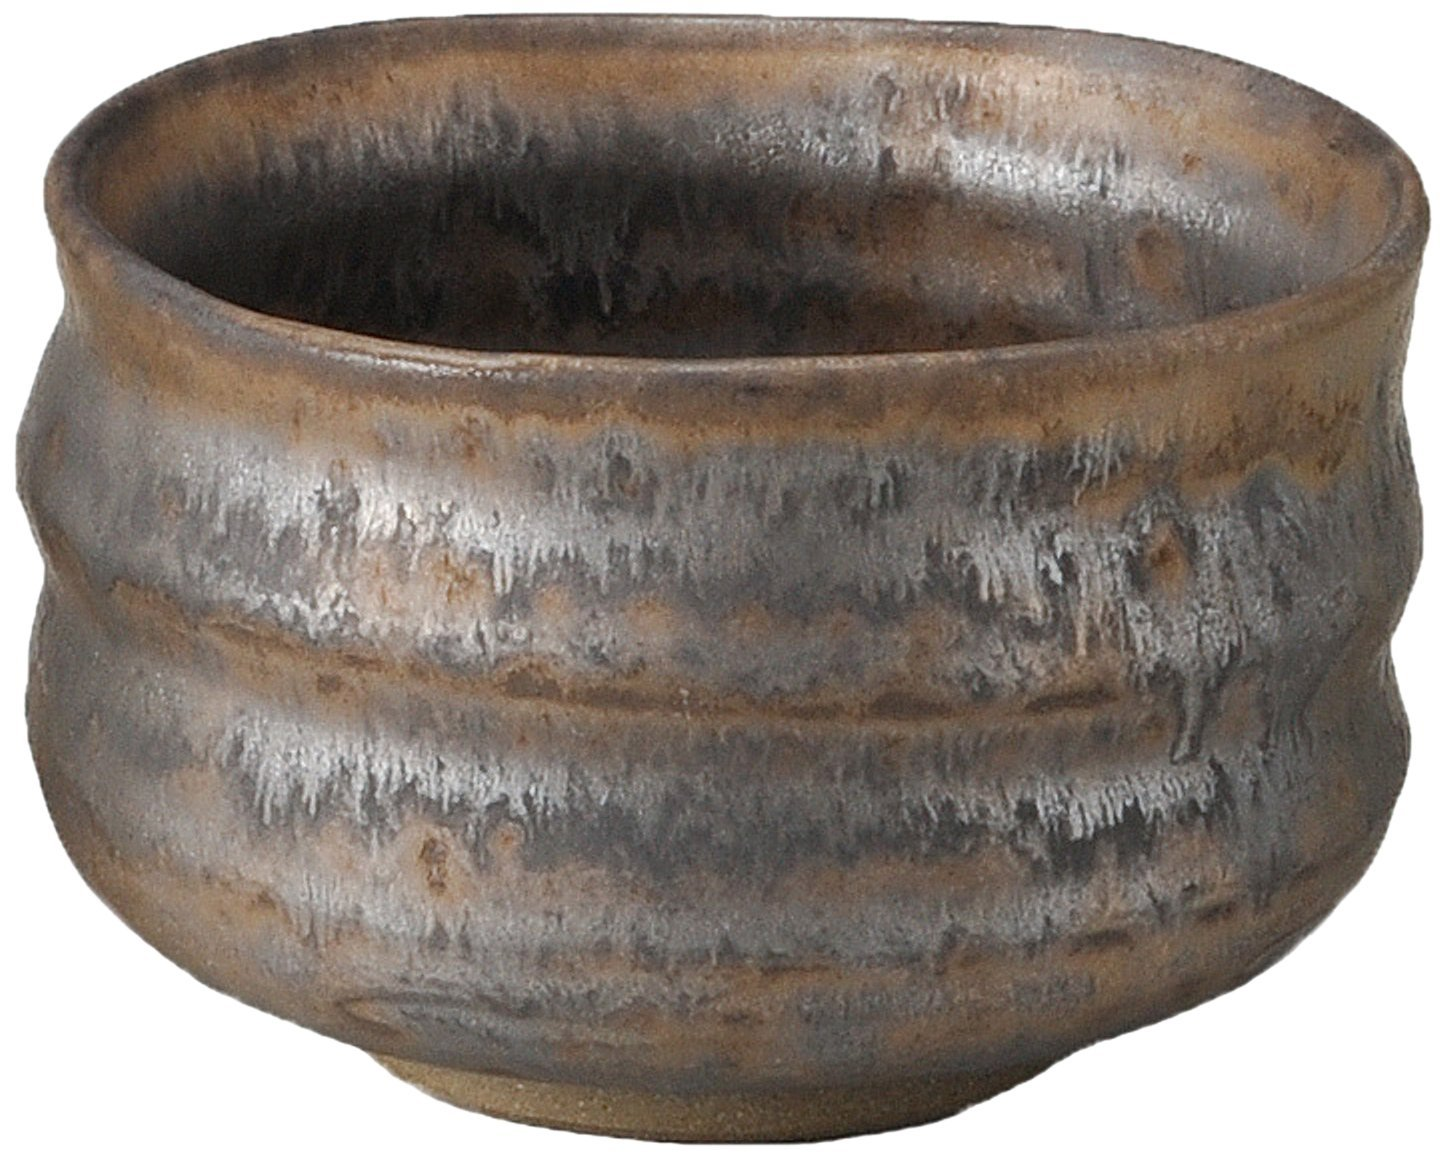 Yamakiikai Japanese Tea cup Matcha Bowl Brown Ibushi pattern made by 高瀬 (Takase) F1728 from Japan